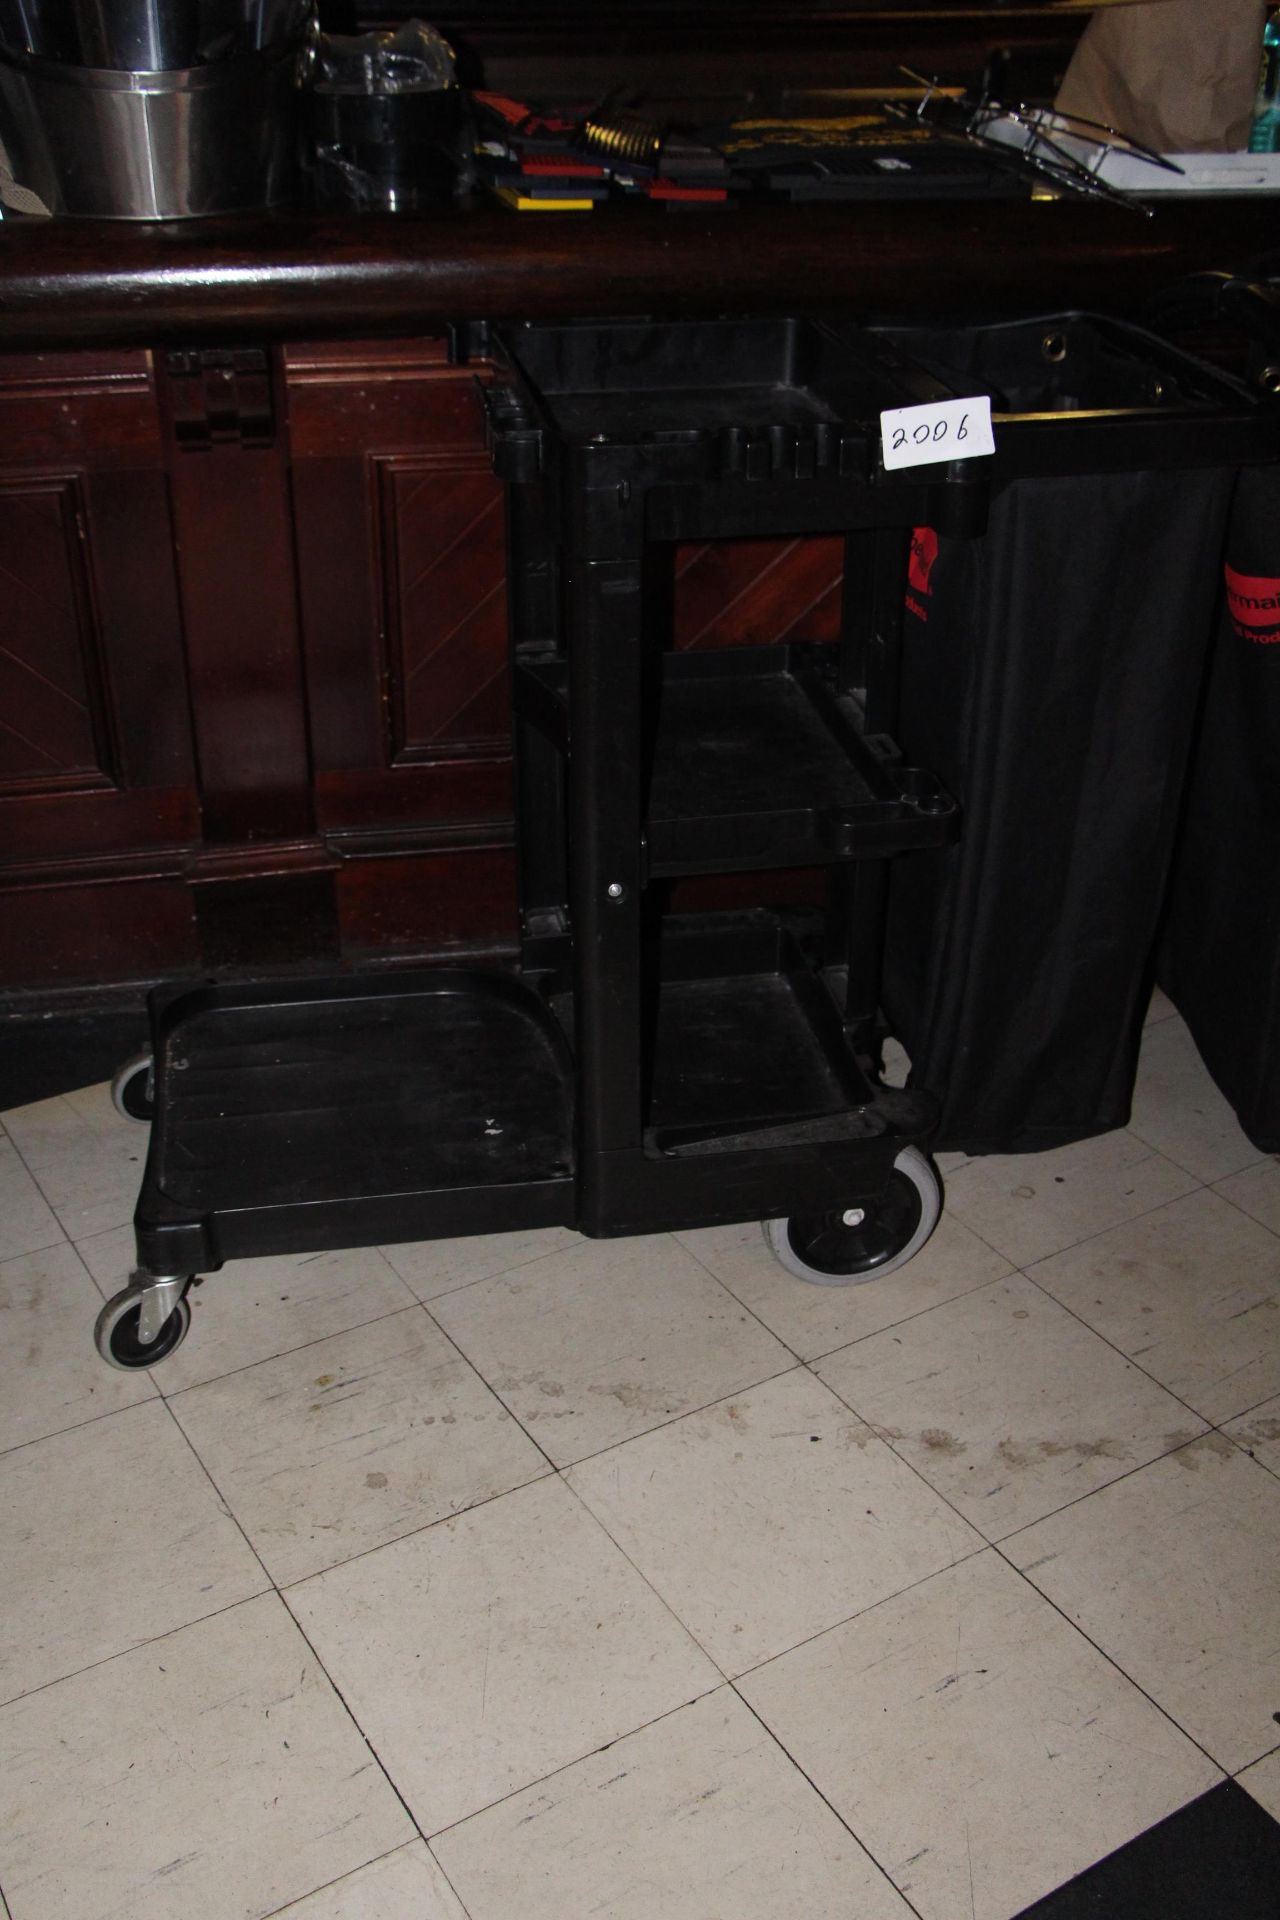 Lot 2006 - Janitor cart